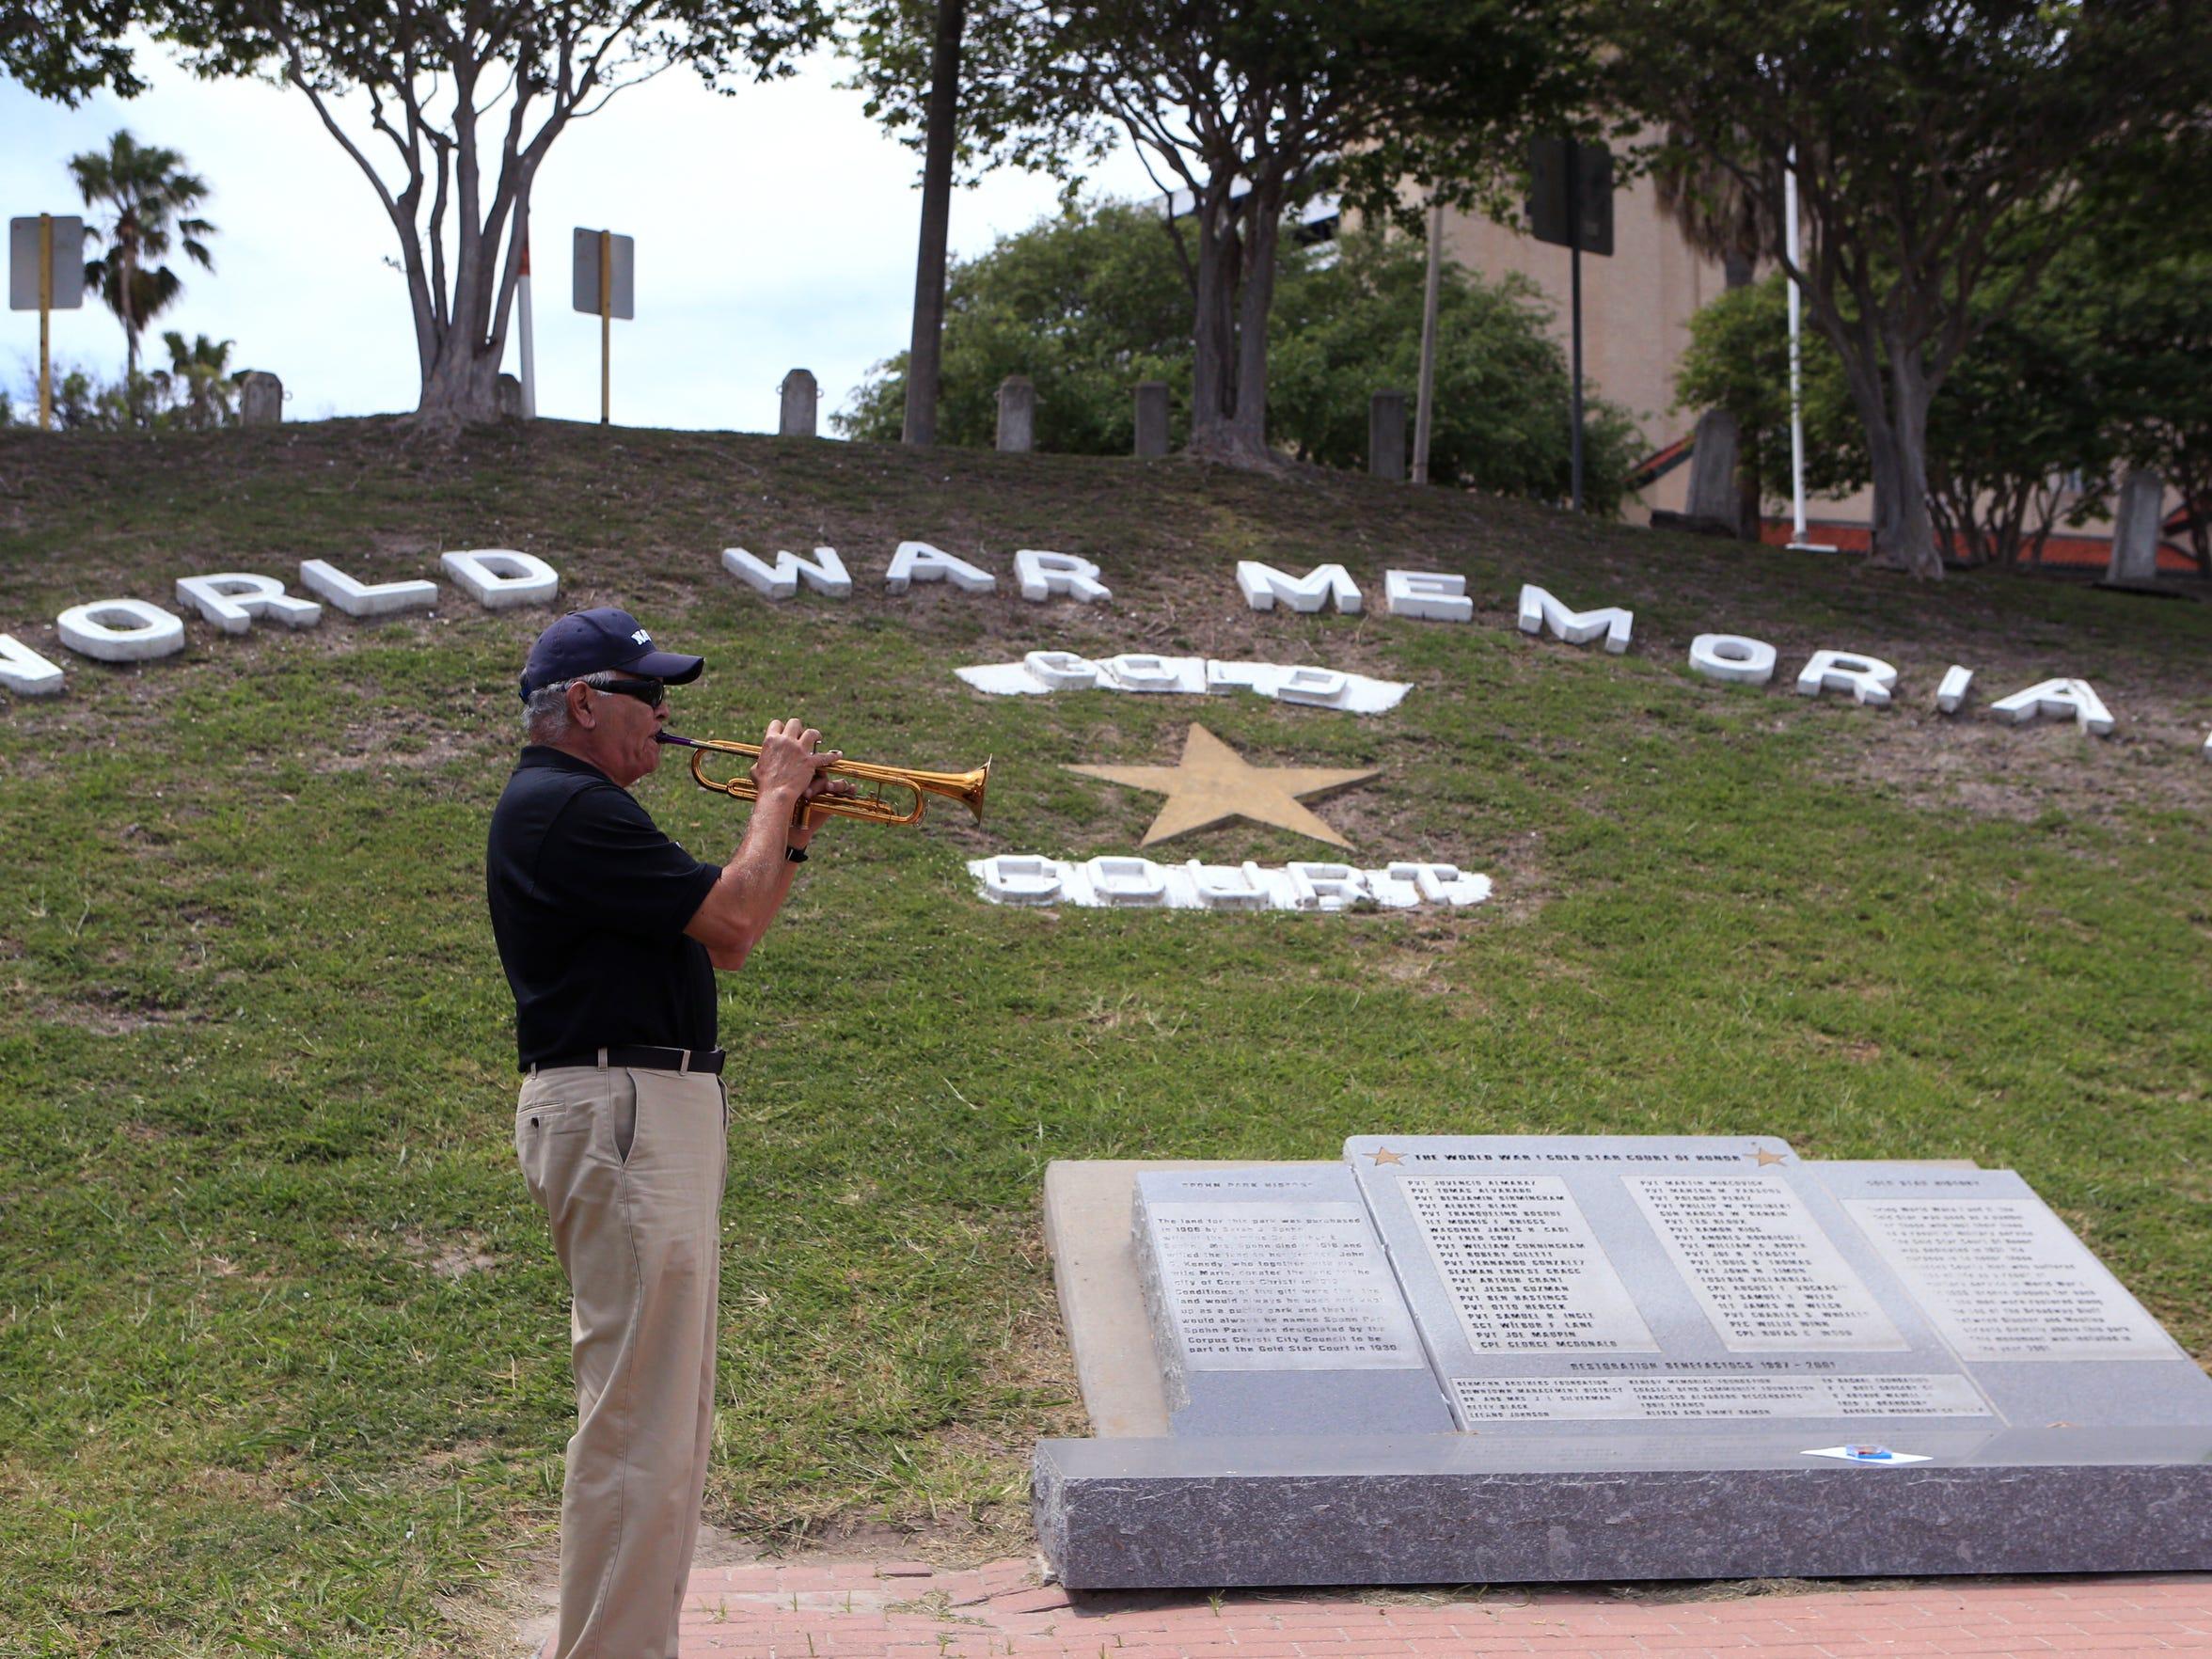 Al Rivera, a member of the Veterans Band of Corpus